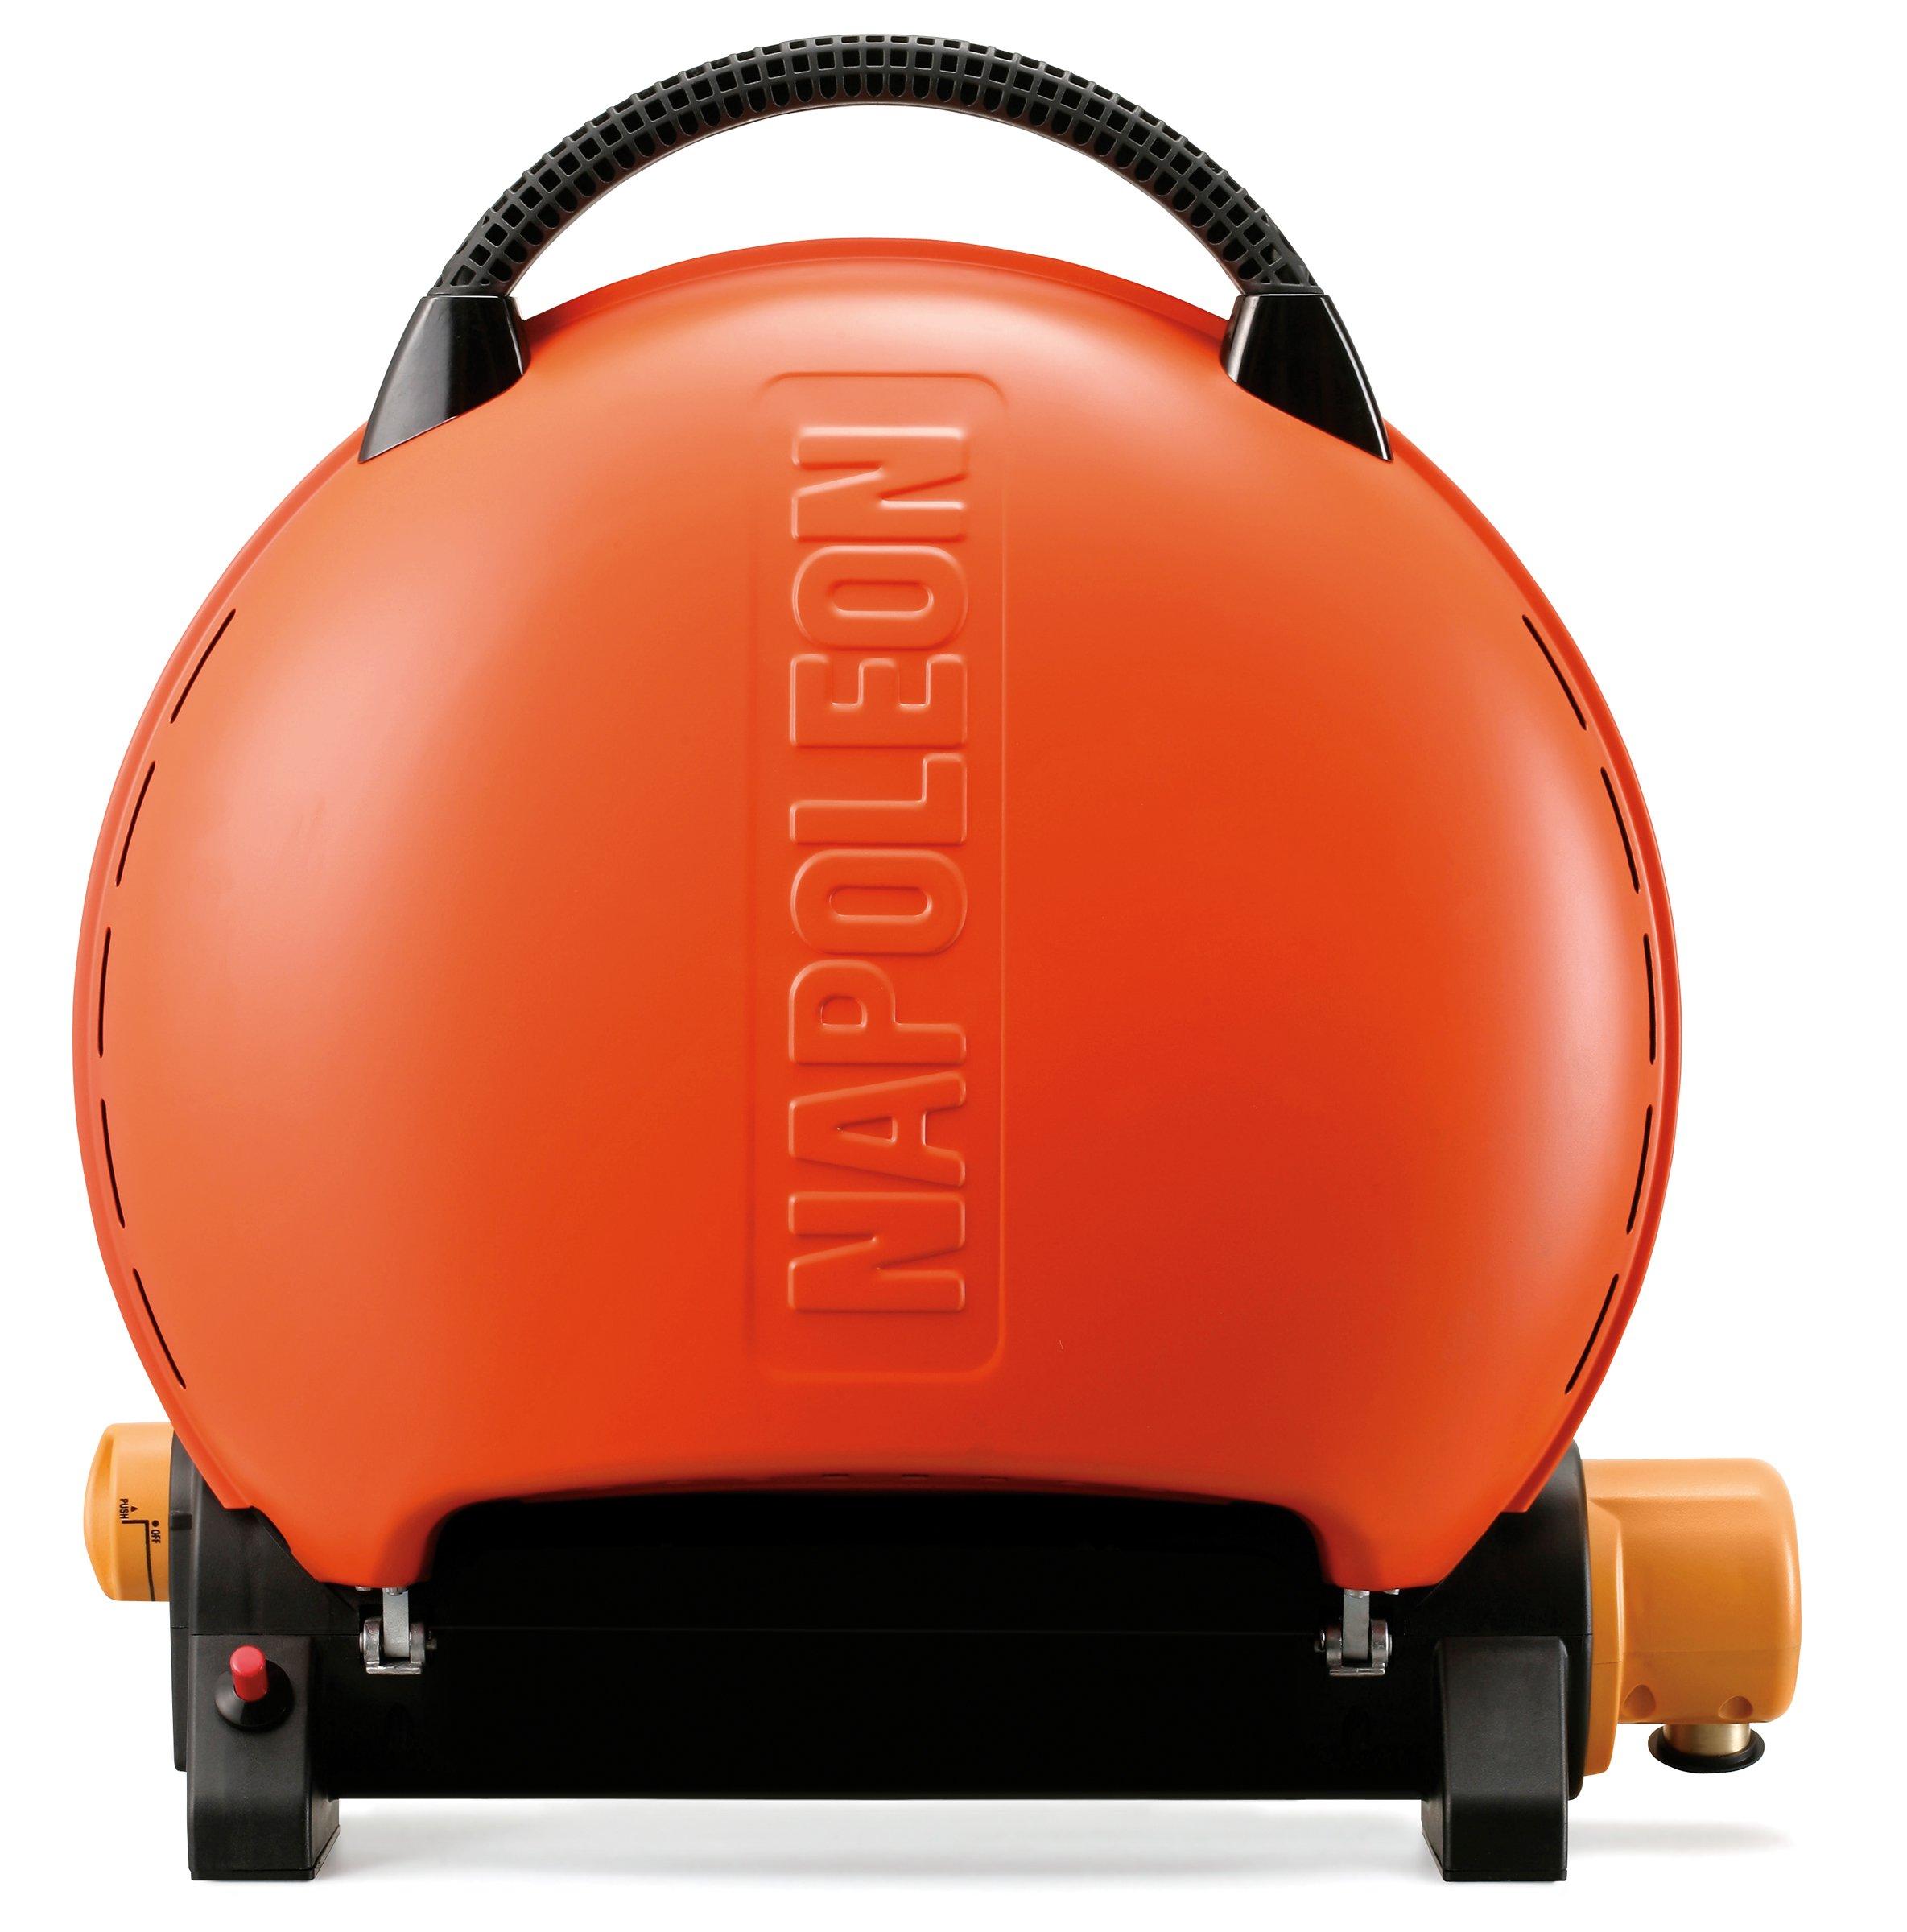 Napoleon TQ2225PO Travel Q Portable Grill, Orange by Napoleon